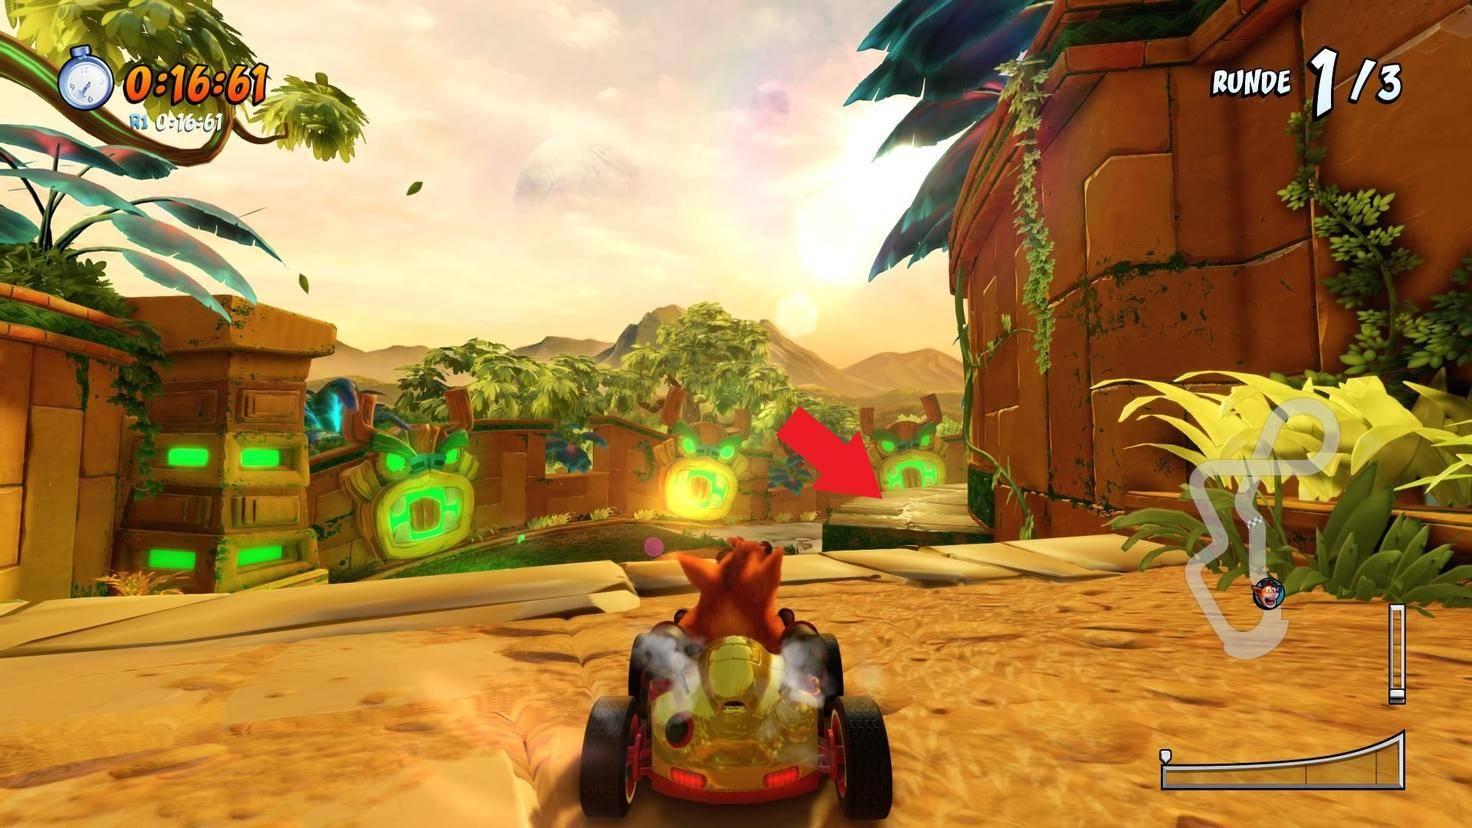 Crash-Team-Racing-Nitro-Fueled-Abkürzung-Dschungel-Boogie-1